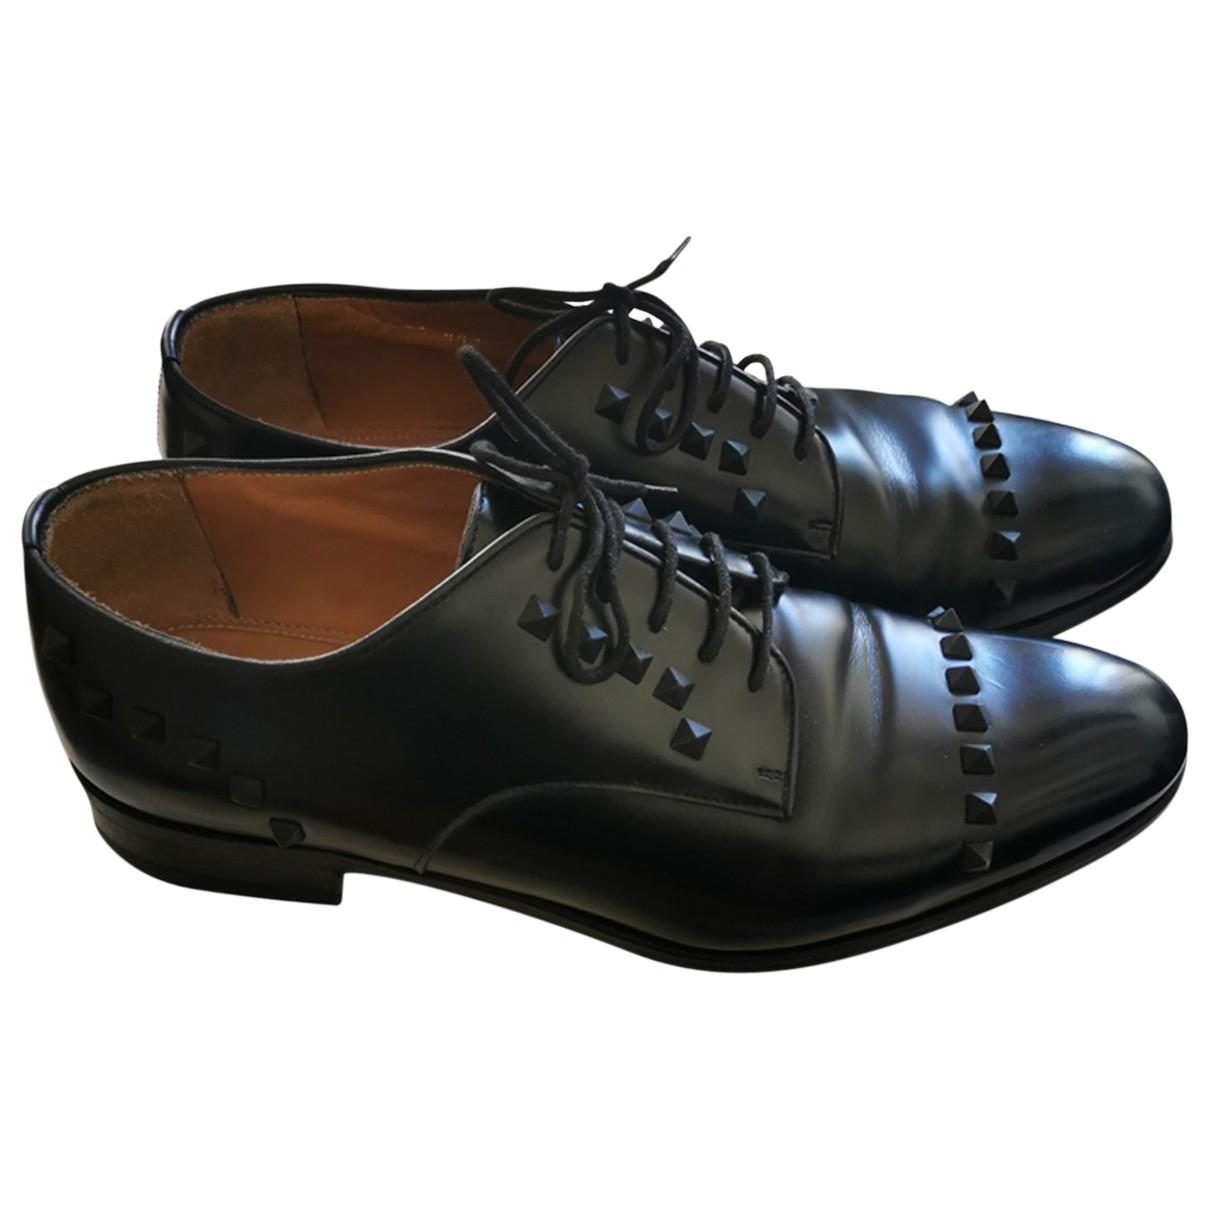 Valentino Garavani \N Black Leather Lace ups for Men 44.5 EU